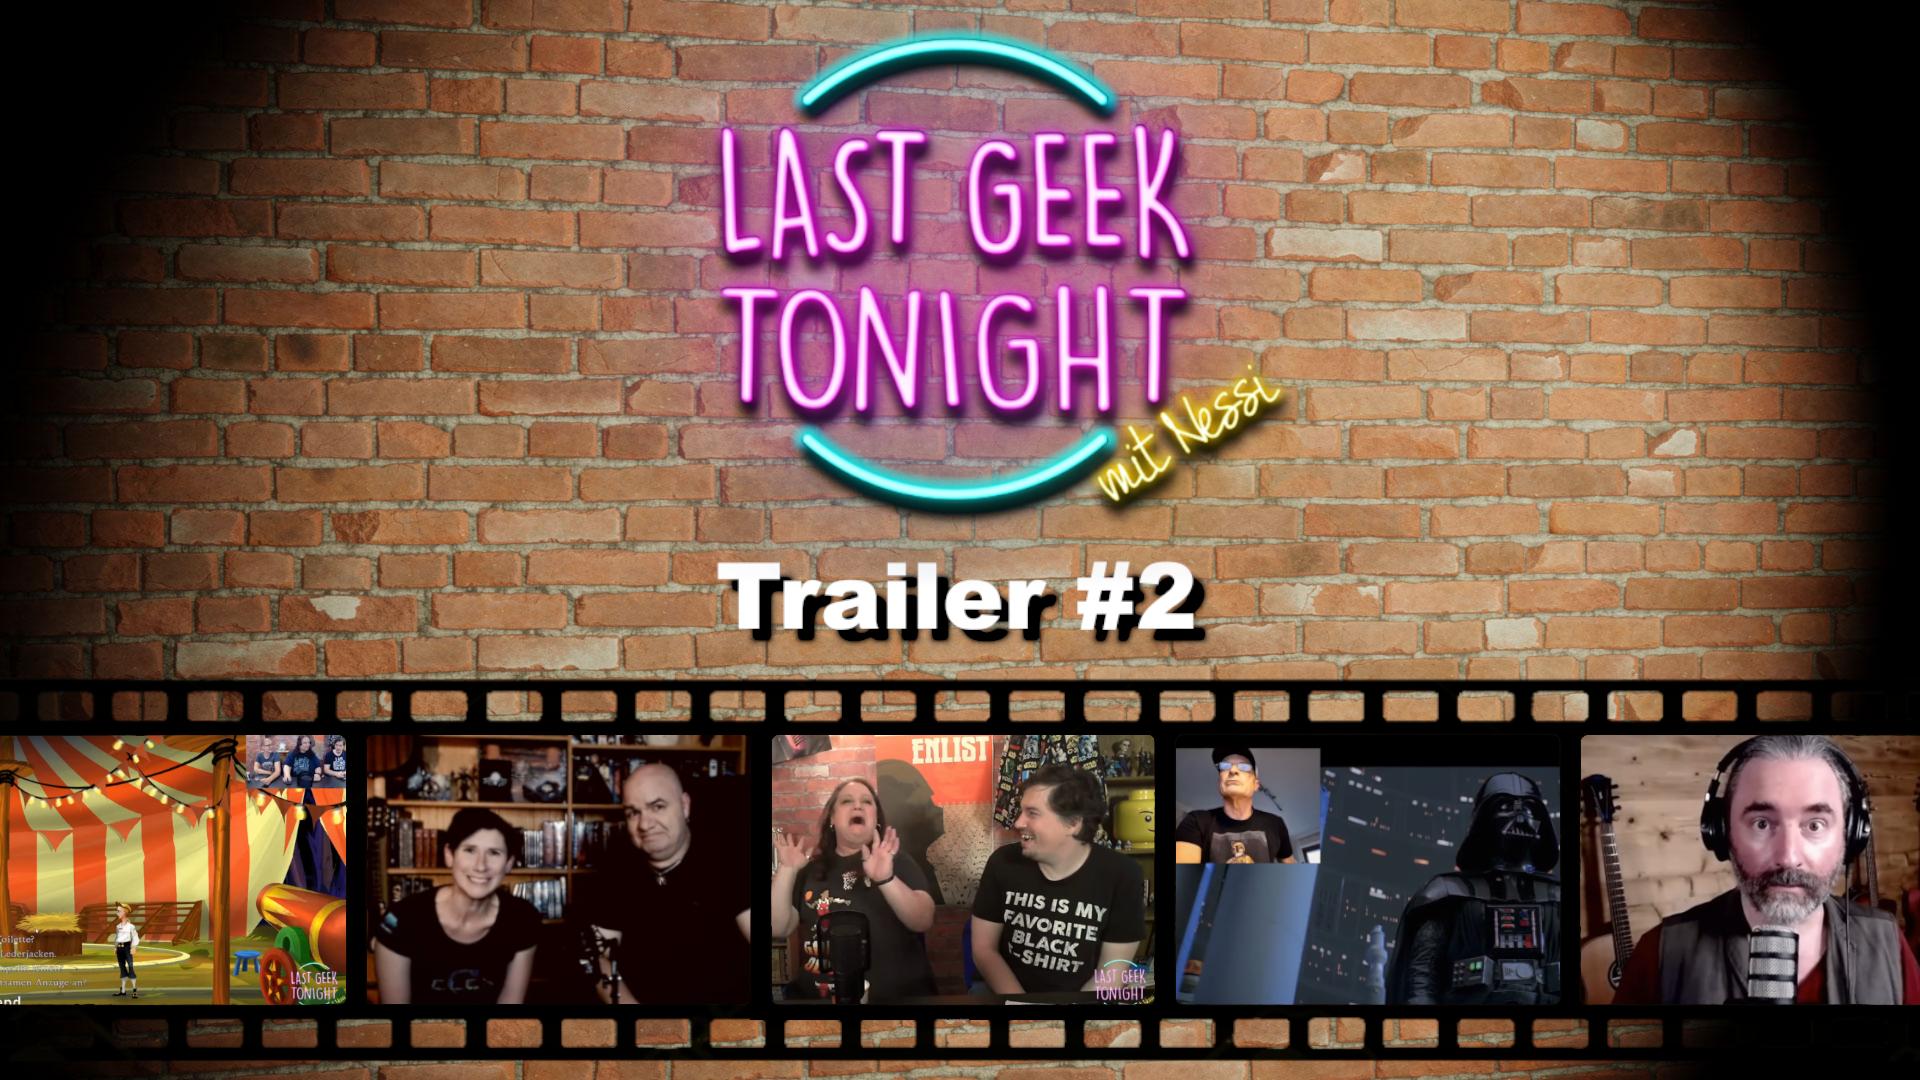 thumb_trailer#2